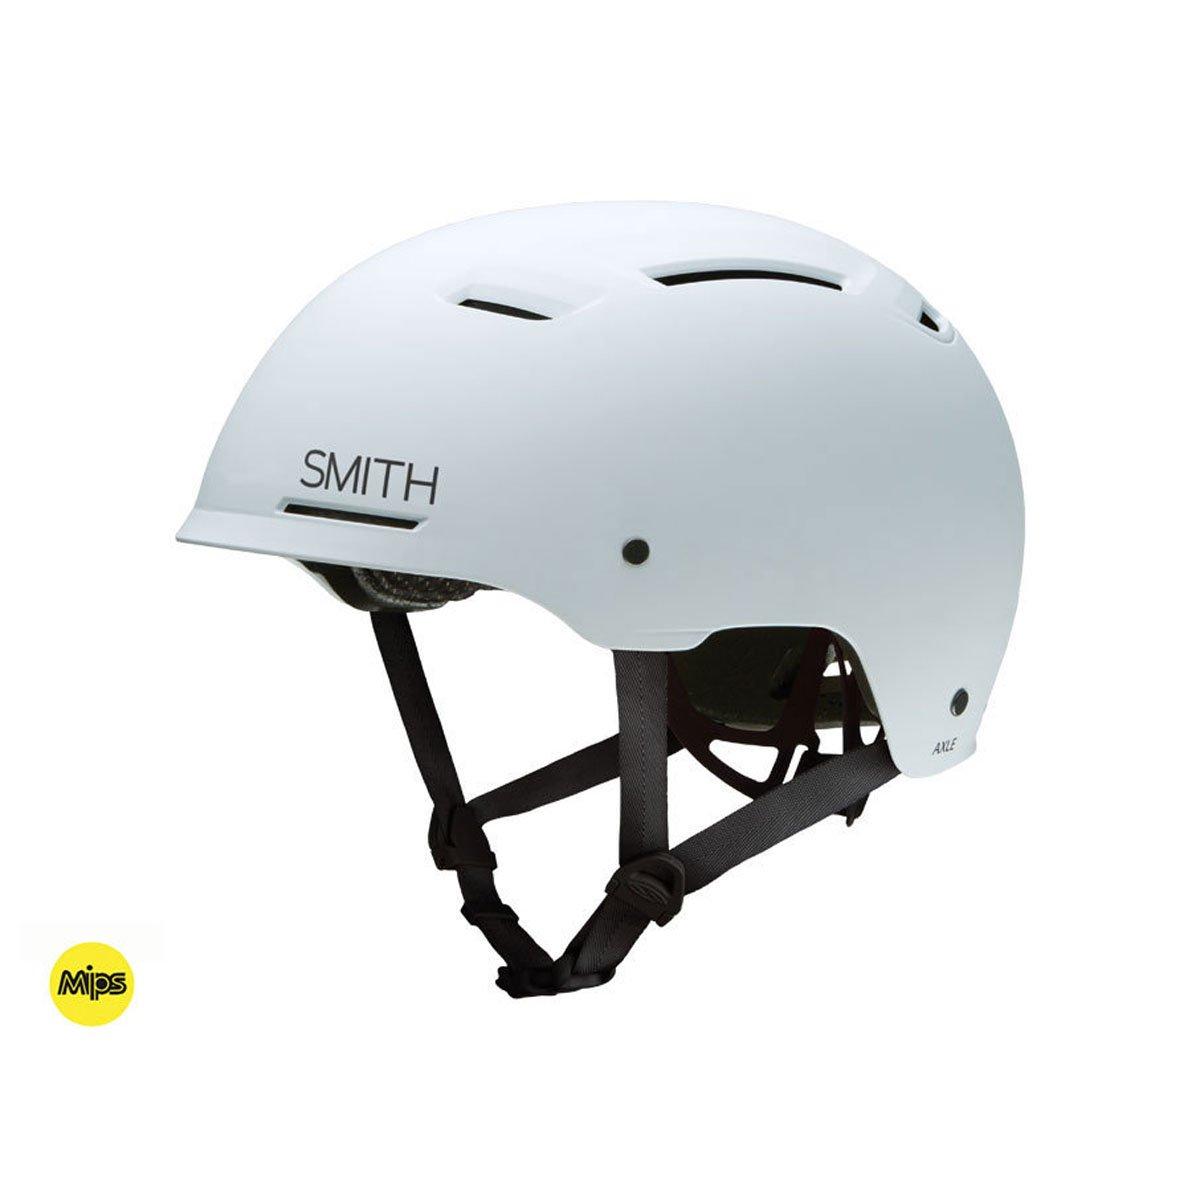 Smith Optics Axle MIPS Adult MTB Cycling Helmet - Matte White / Small by Smith   B00QKGL94O